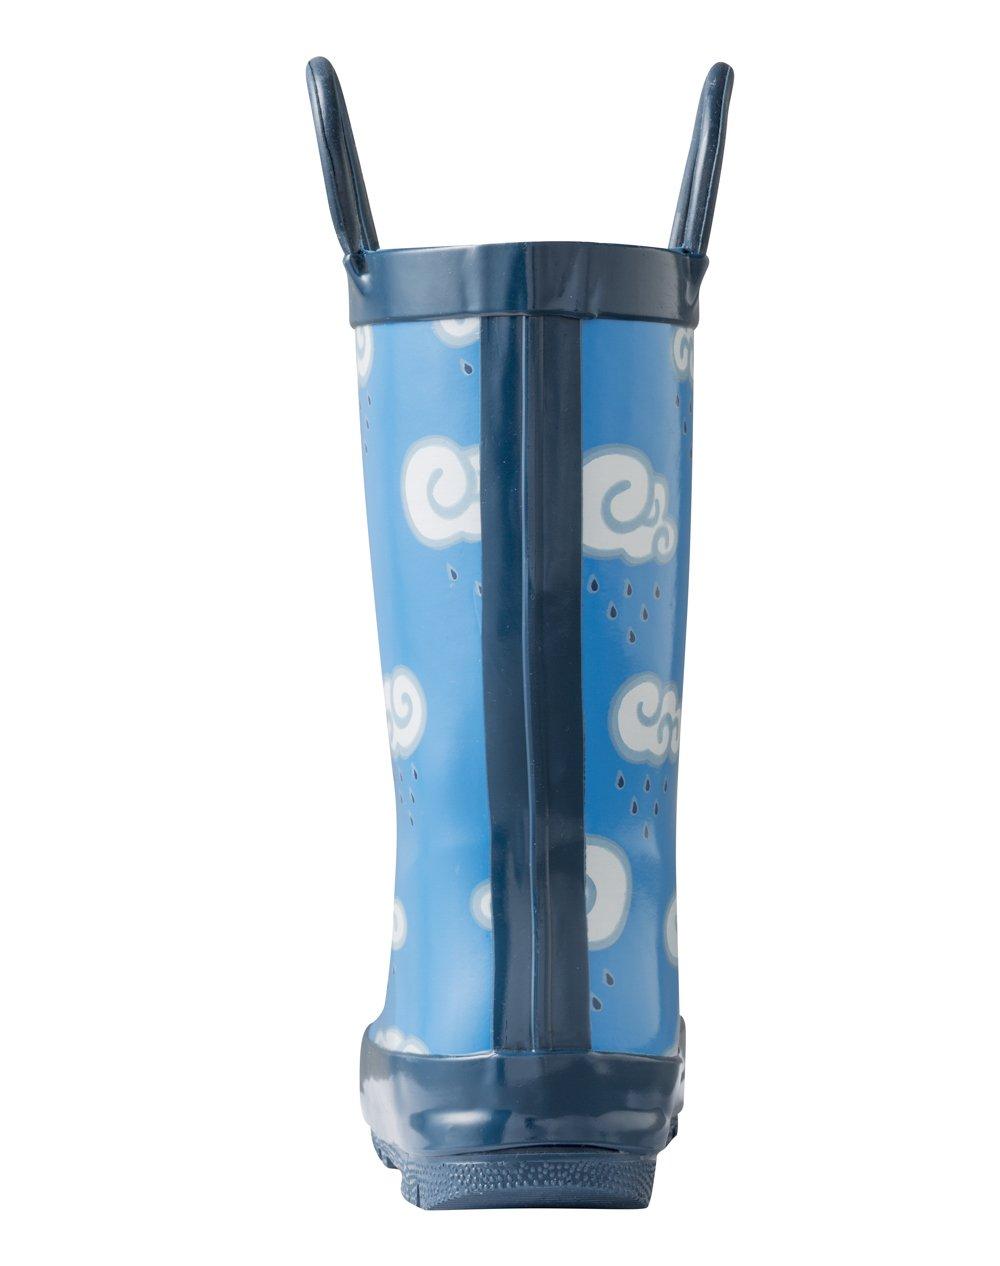 Oakiwear Kids Rubber Rain Boots with Easy-On Handles, Clouds, 9T US Toddler by Oakiwear (Image #5)